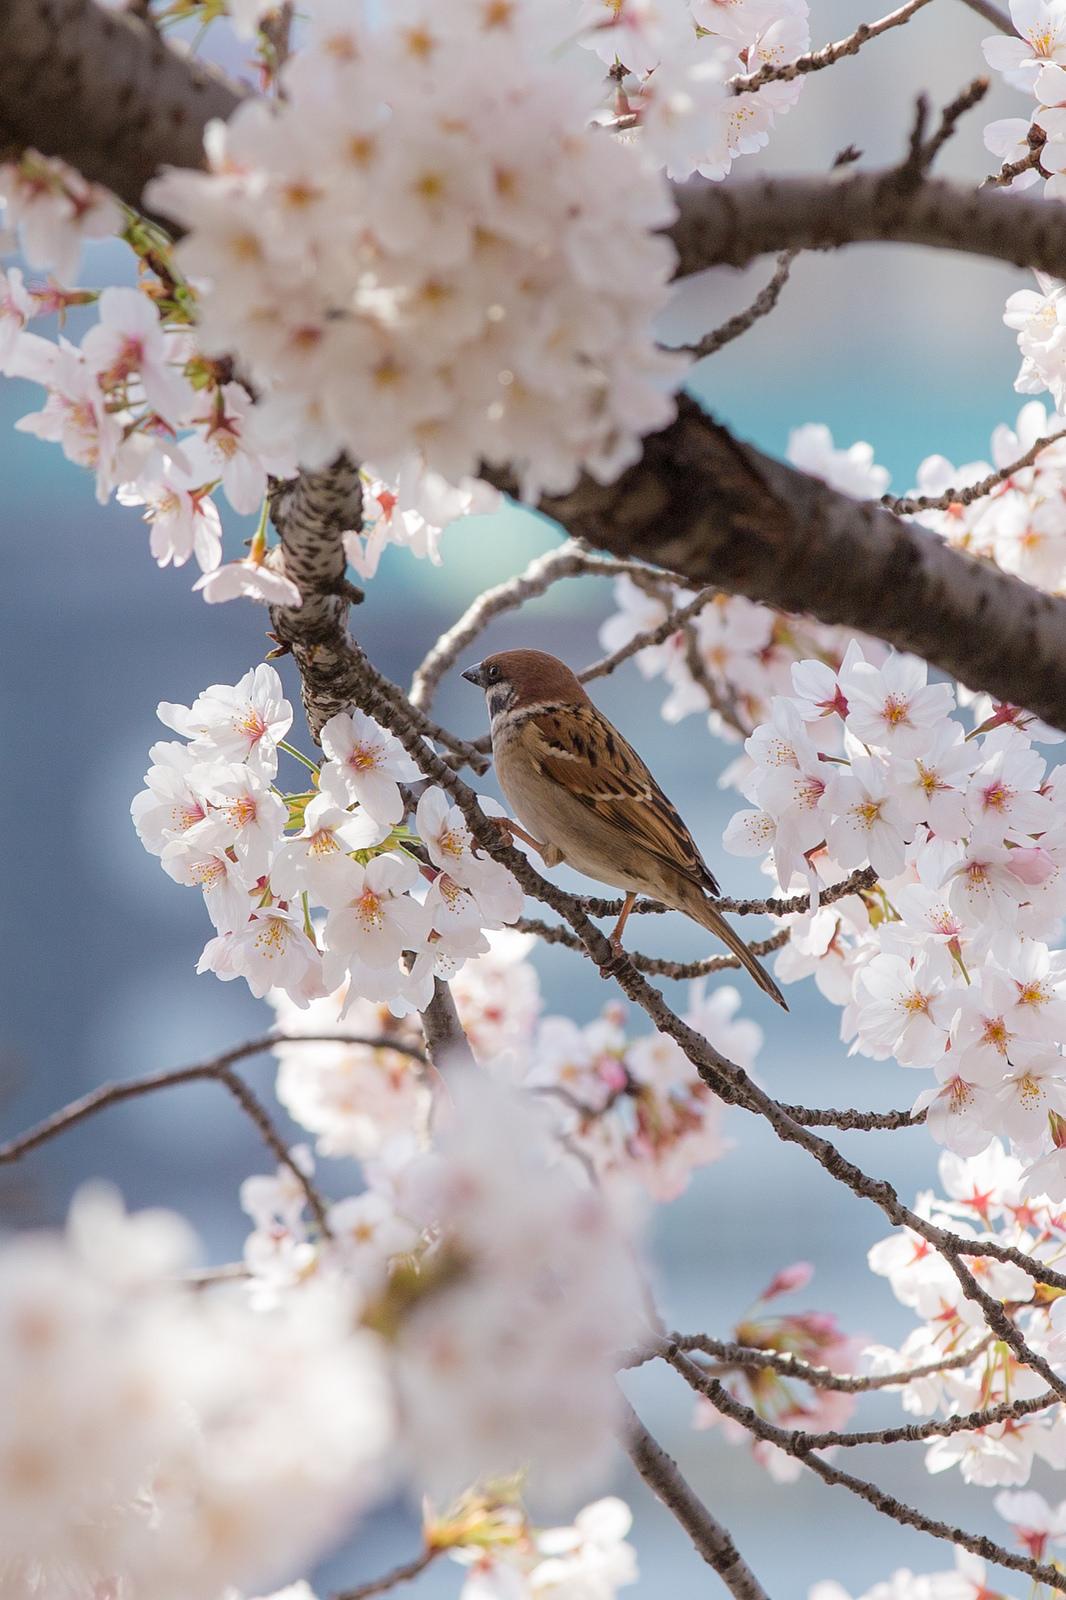 Drawn sakura blossom sparrows Cherry blossom Cherry Sparrow blossoms